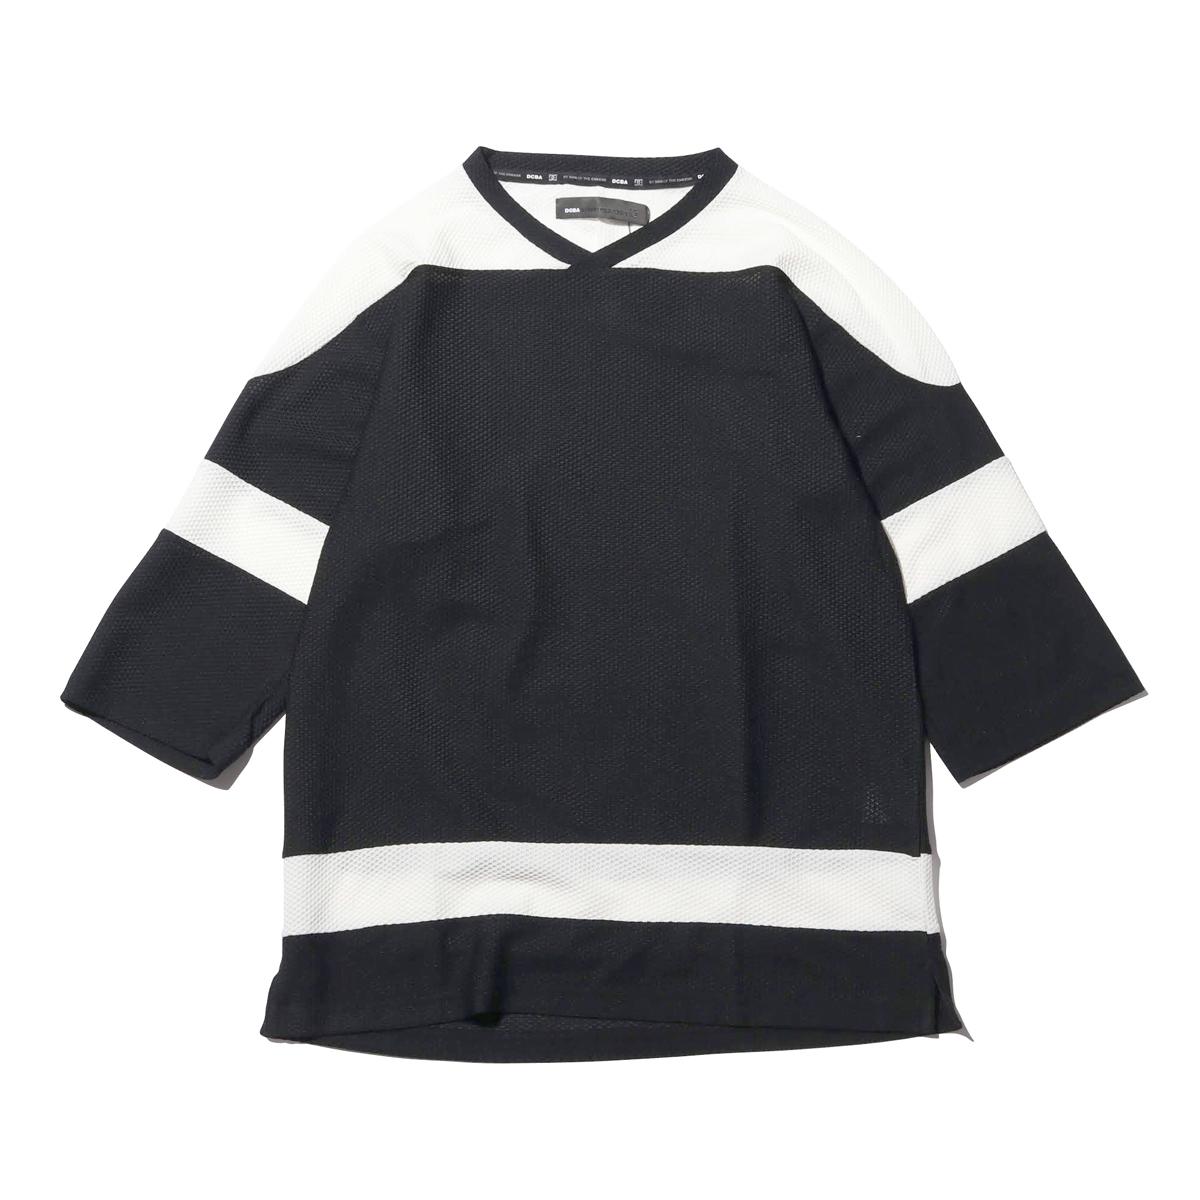 DC SHOES DCBA 19 HOCKEY SS (ディーシーシューズ DCBA 19 ホッケー SS)BLACK【メンズ Tシャツ】19SS-I